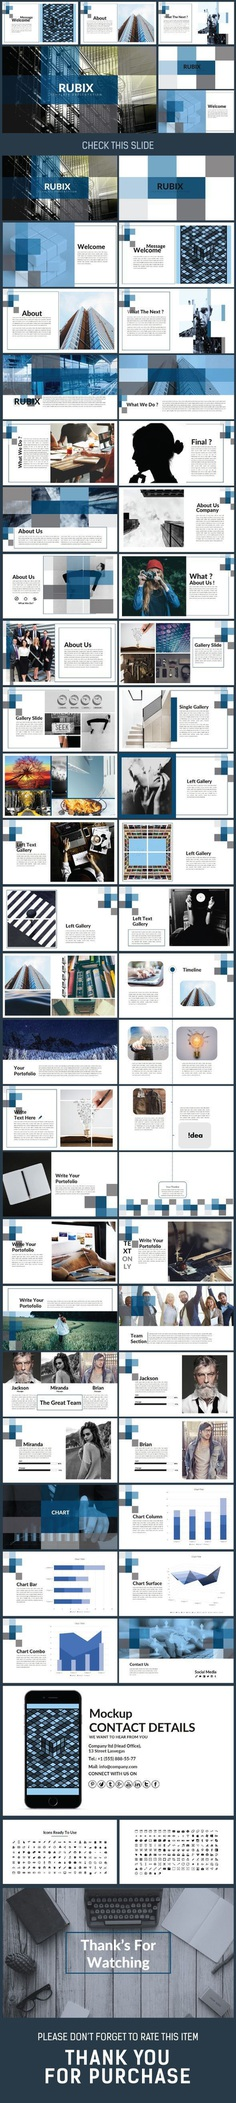 business-infographic-business-infographic-rubix-presentation-power-point-template-creative-powerpo.jpg (590×5261)